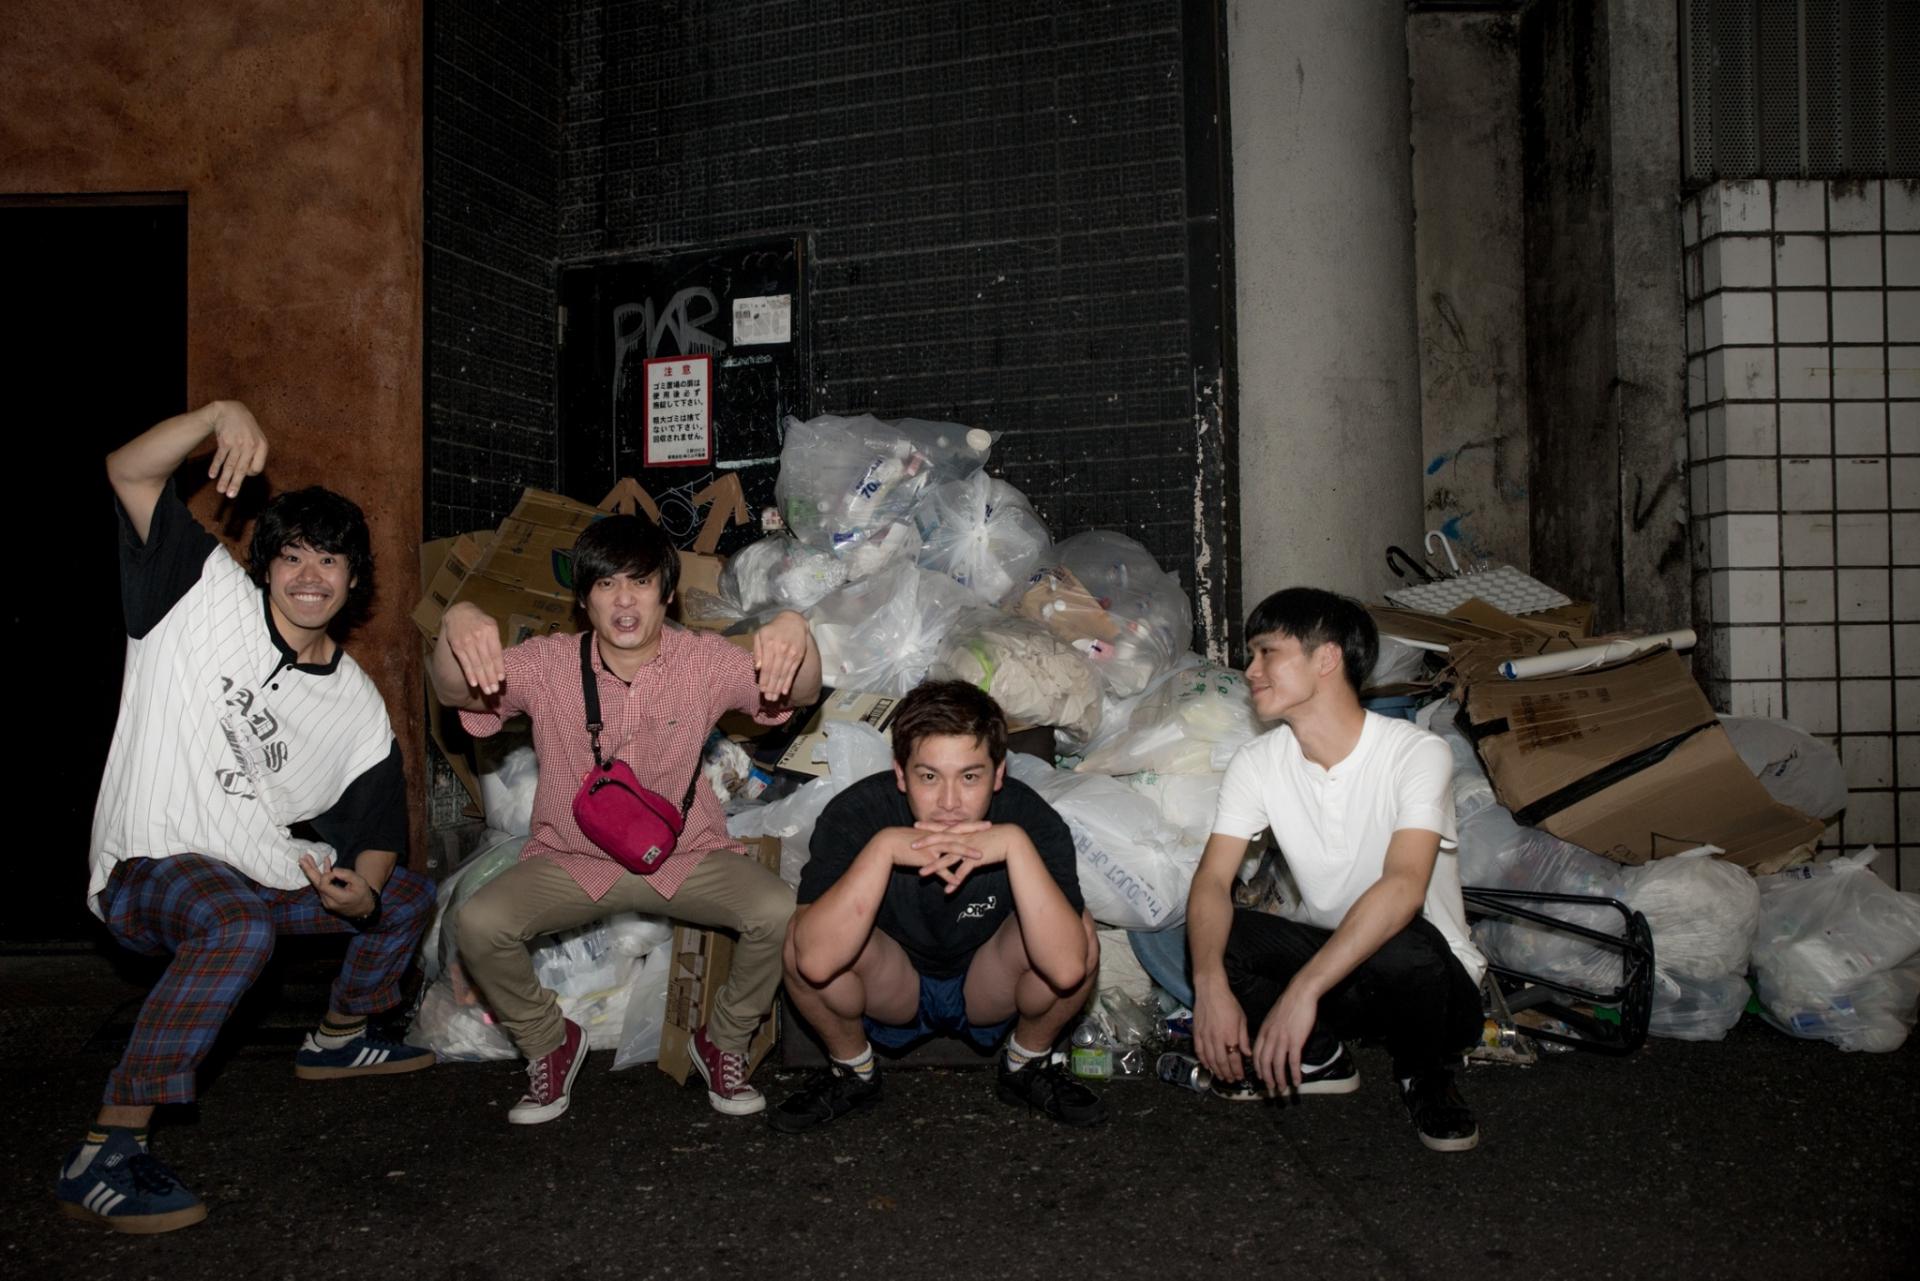 XANADU YOUTHZ(ザナドゥユース)official site437